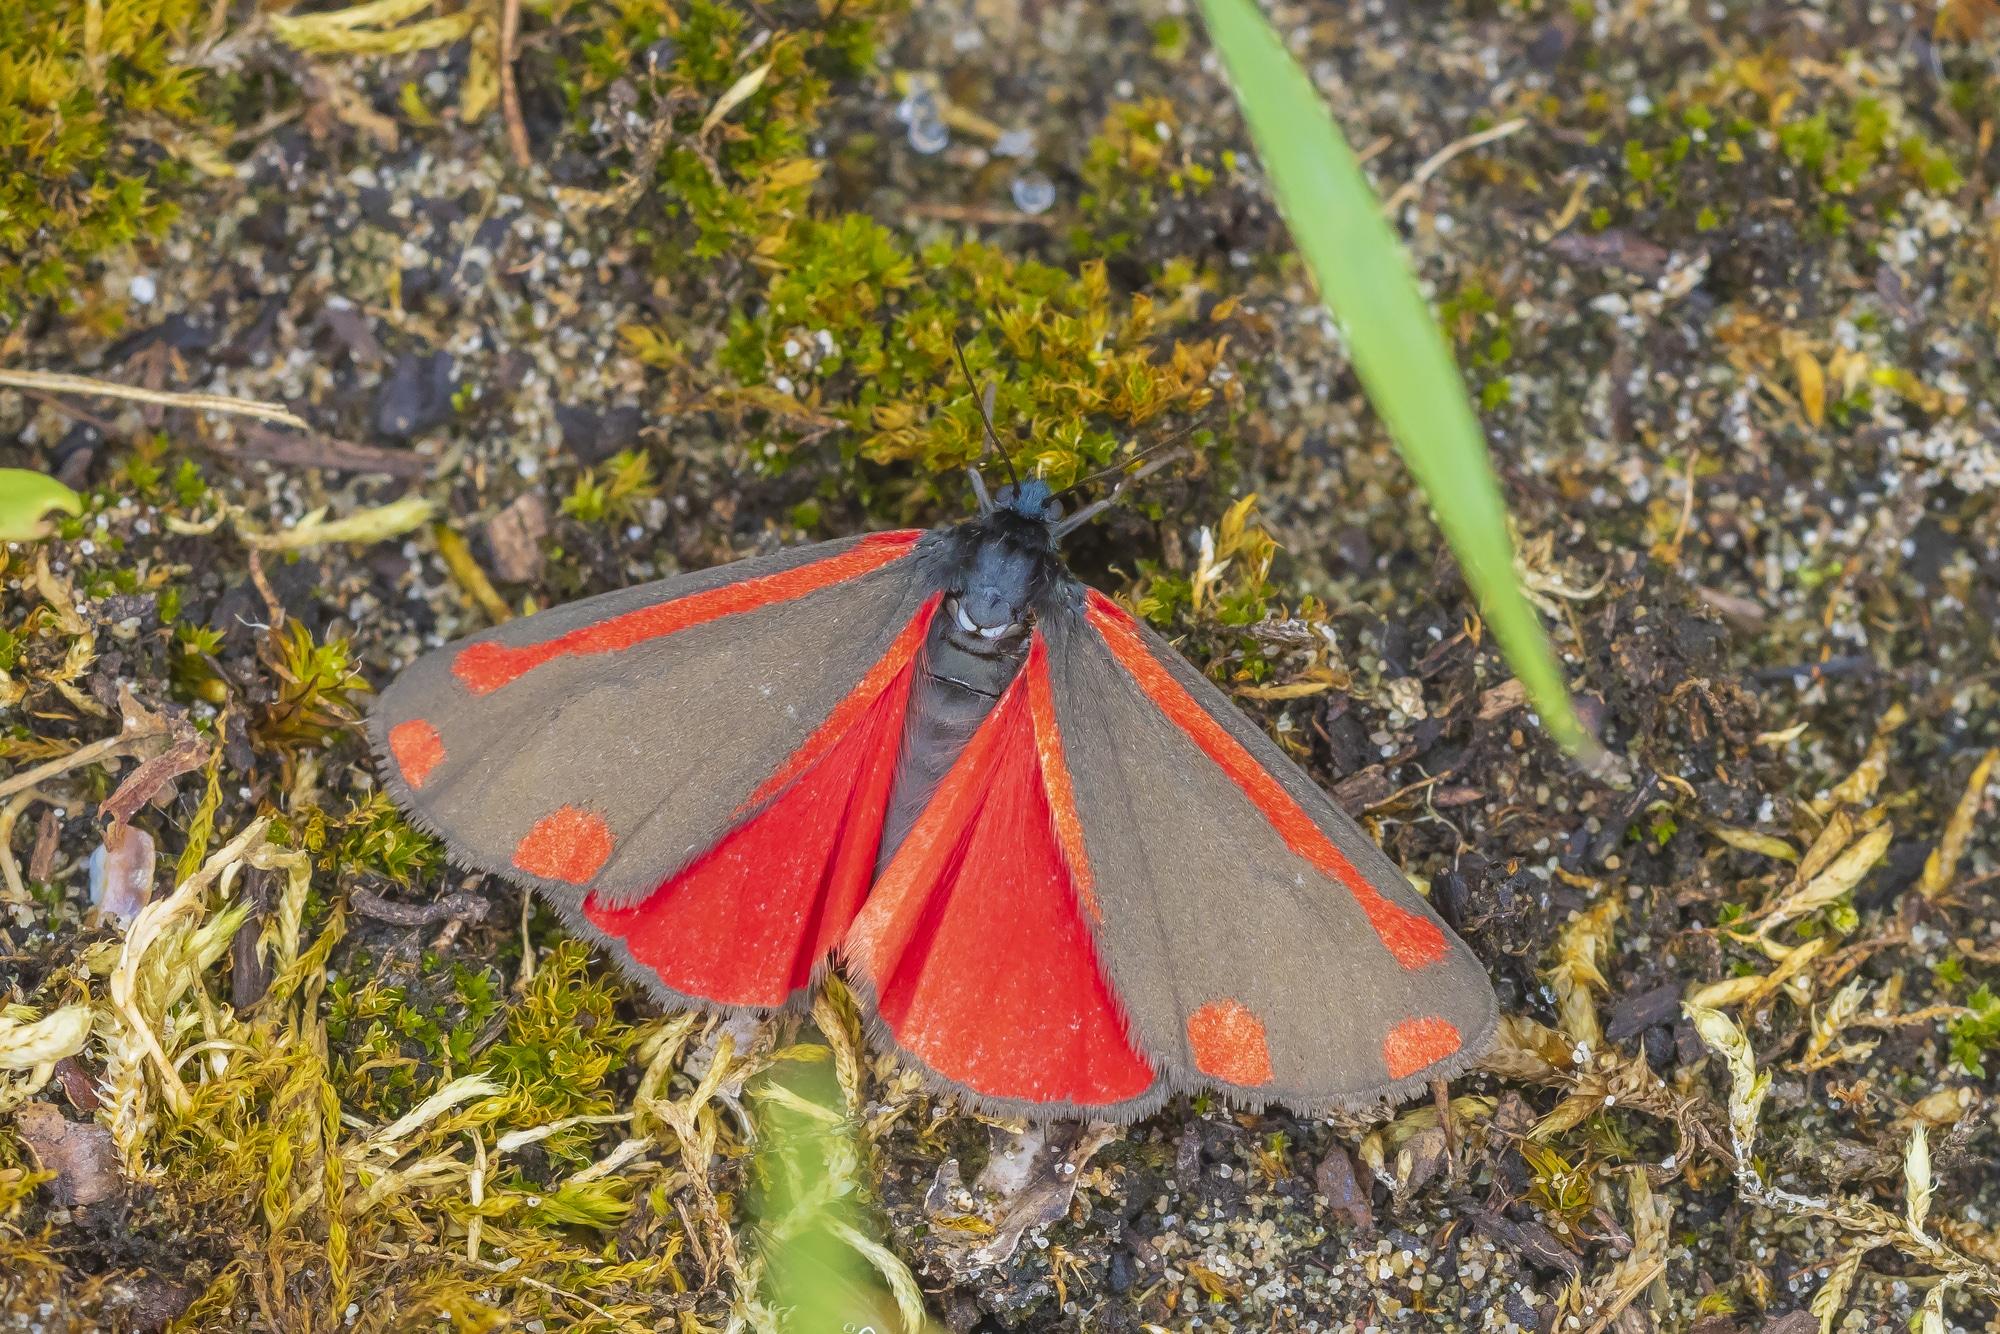 Cinnabar moth, Tyria jacobaeae, resting in a meadow